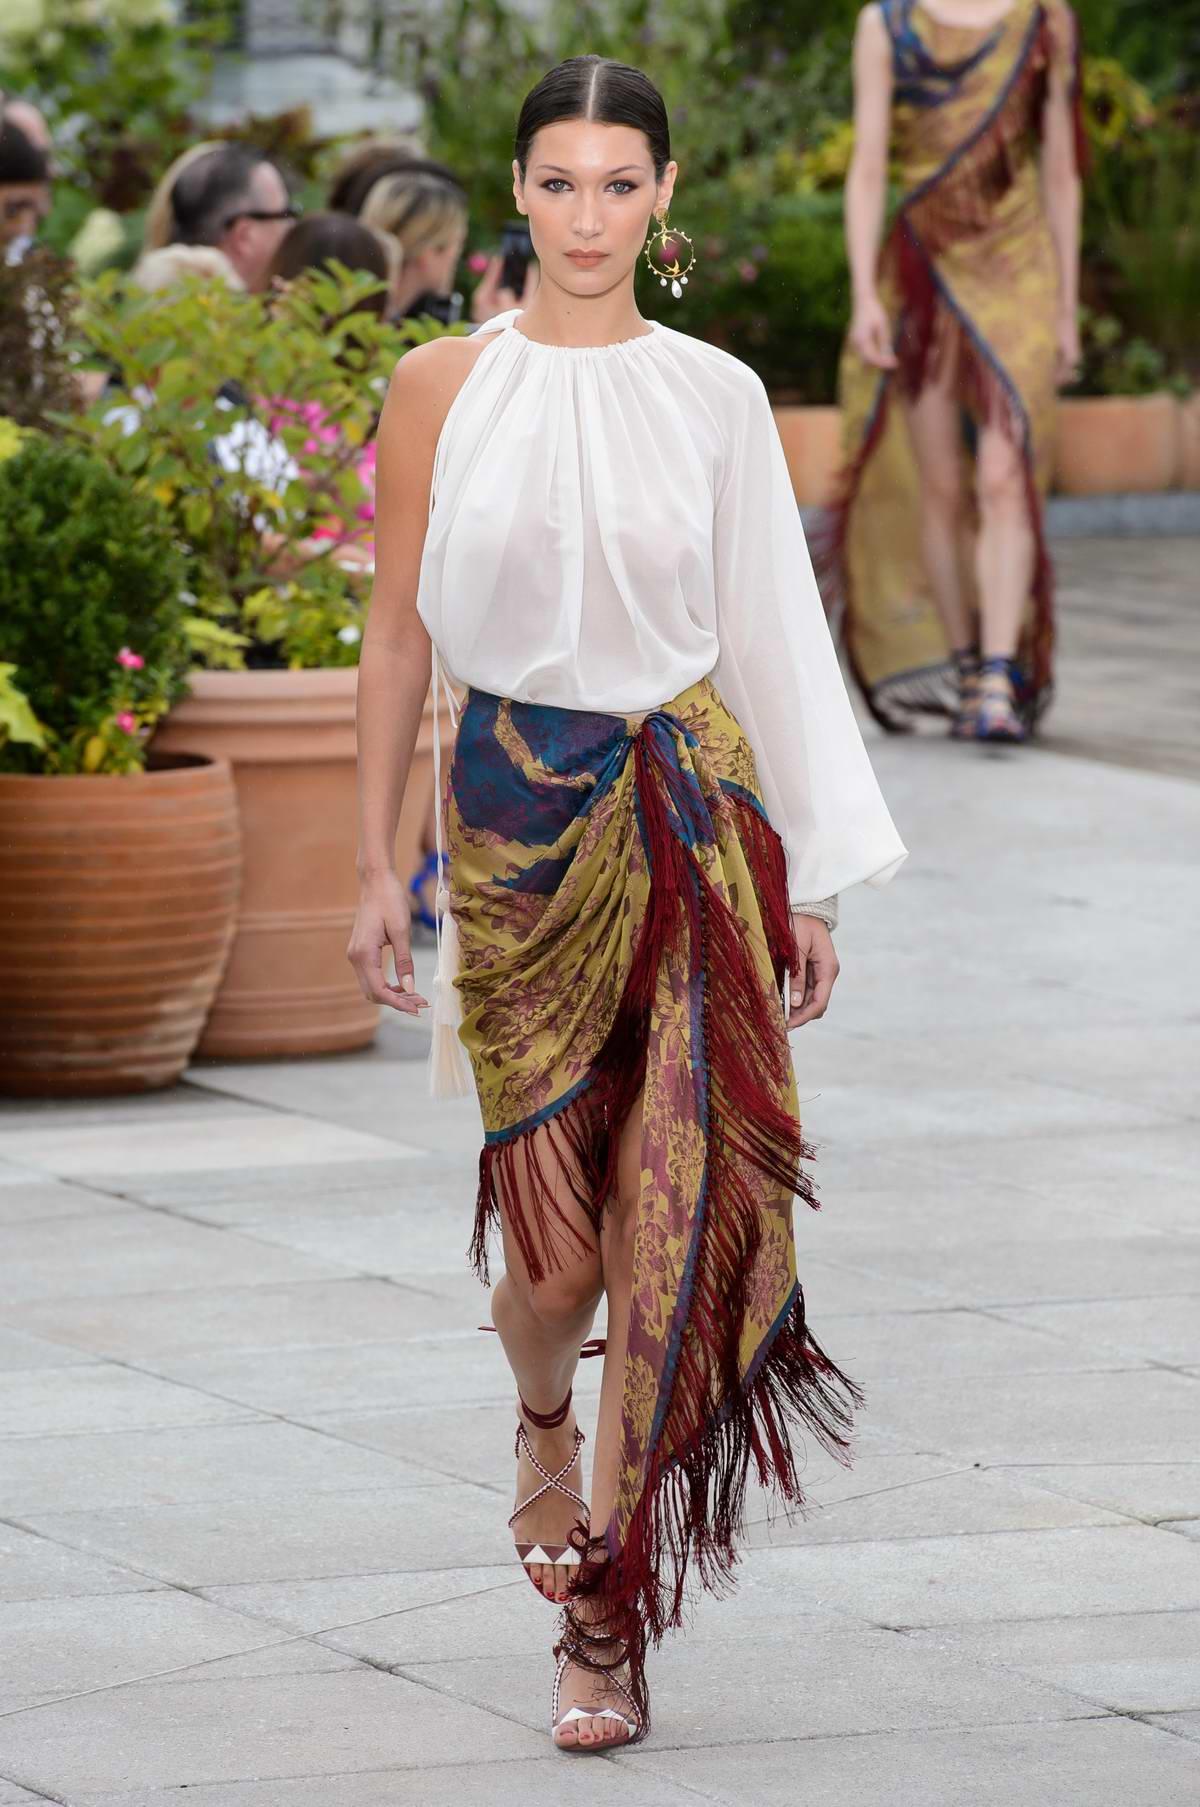 Bella Hadid walks the runway at the Oscar de la Renta Fashion Show, Spring/Summer 2018 during New York Fashion Week in New York City